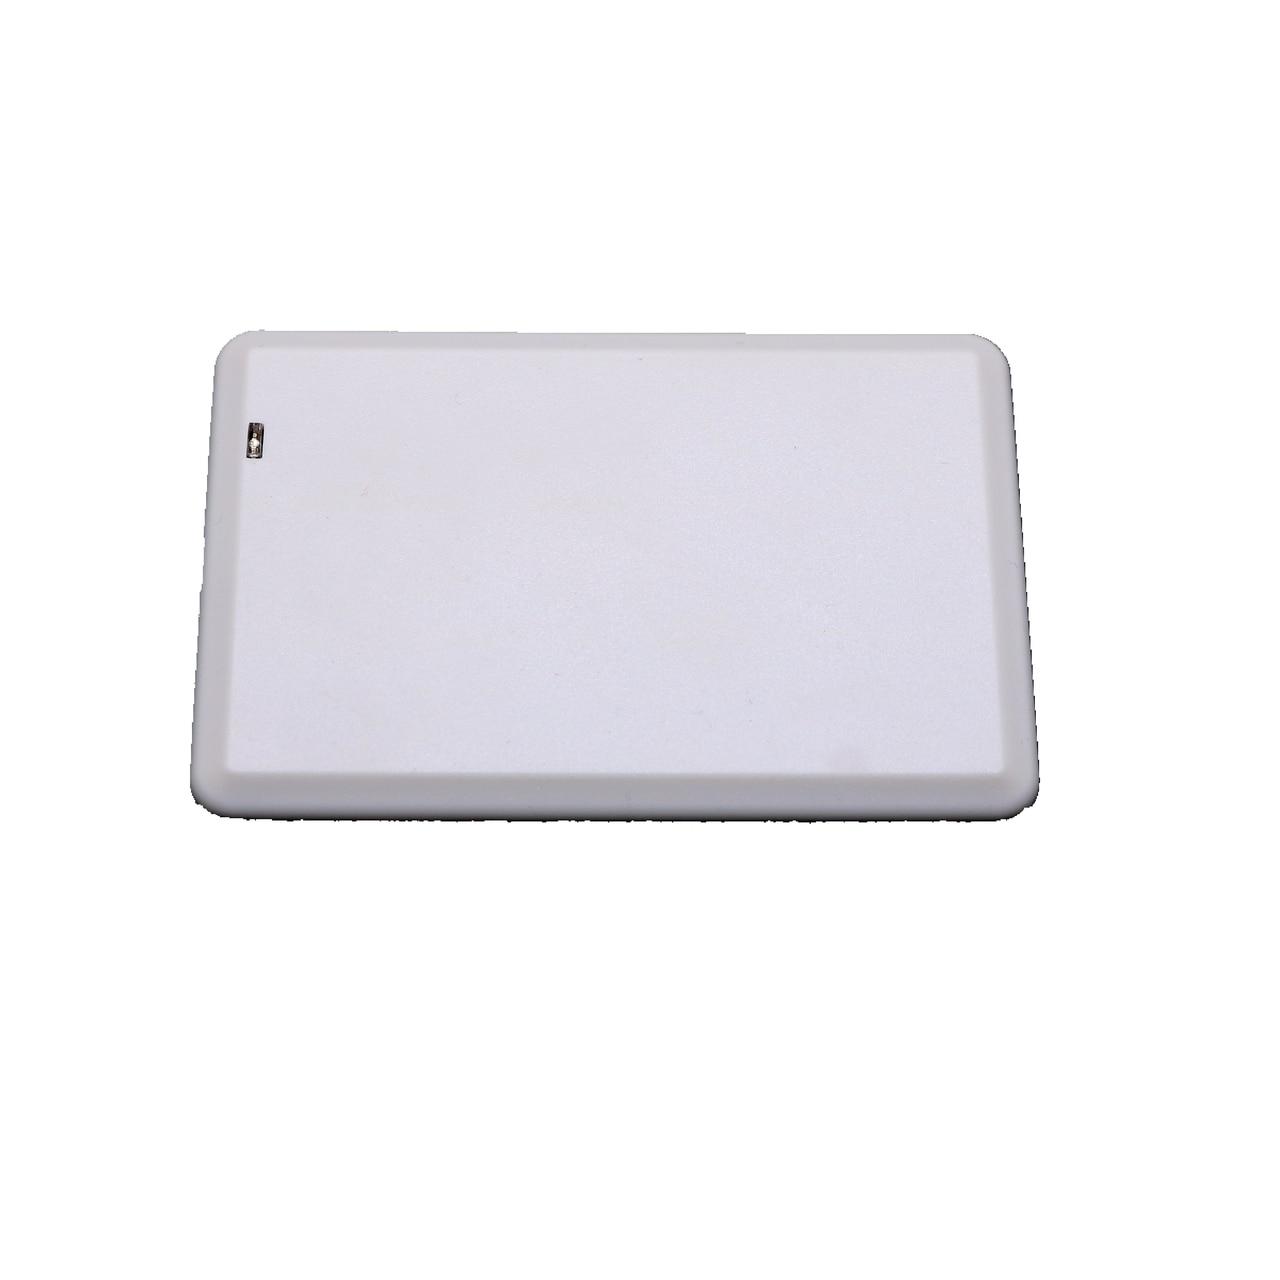 все цены на UHF Reader Writer ISO18000-6C(EPC G2) 6B Read Write 902Mhz 925Mhz 866MHz USB Interface онлайн